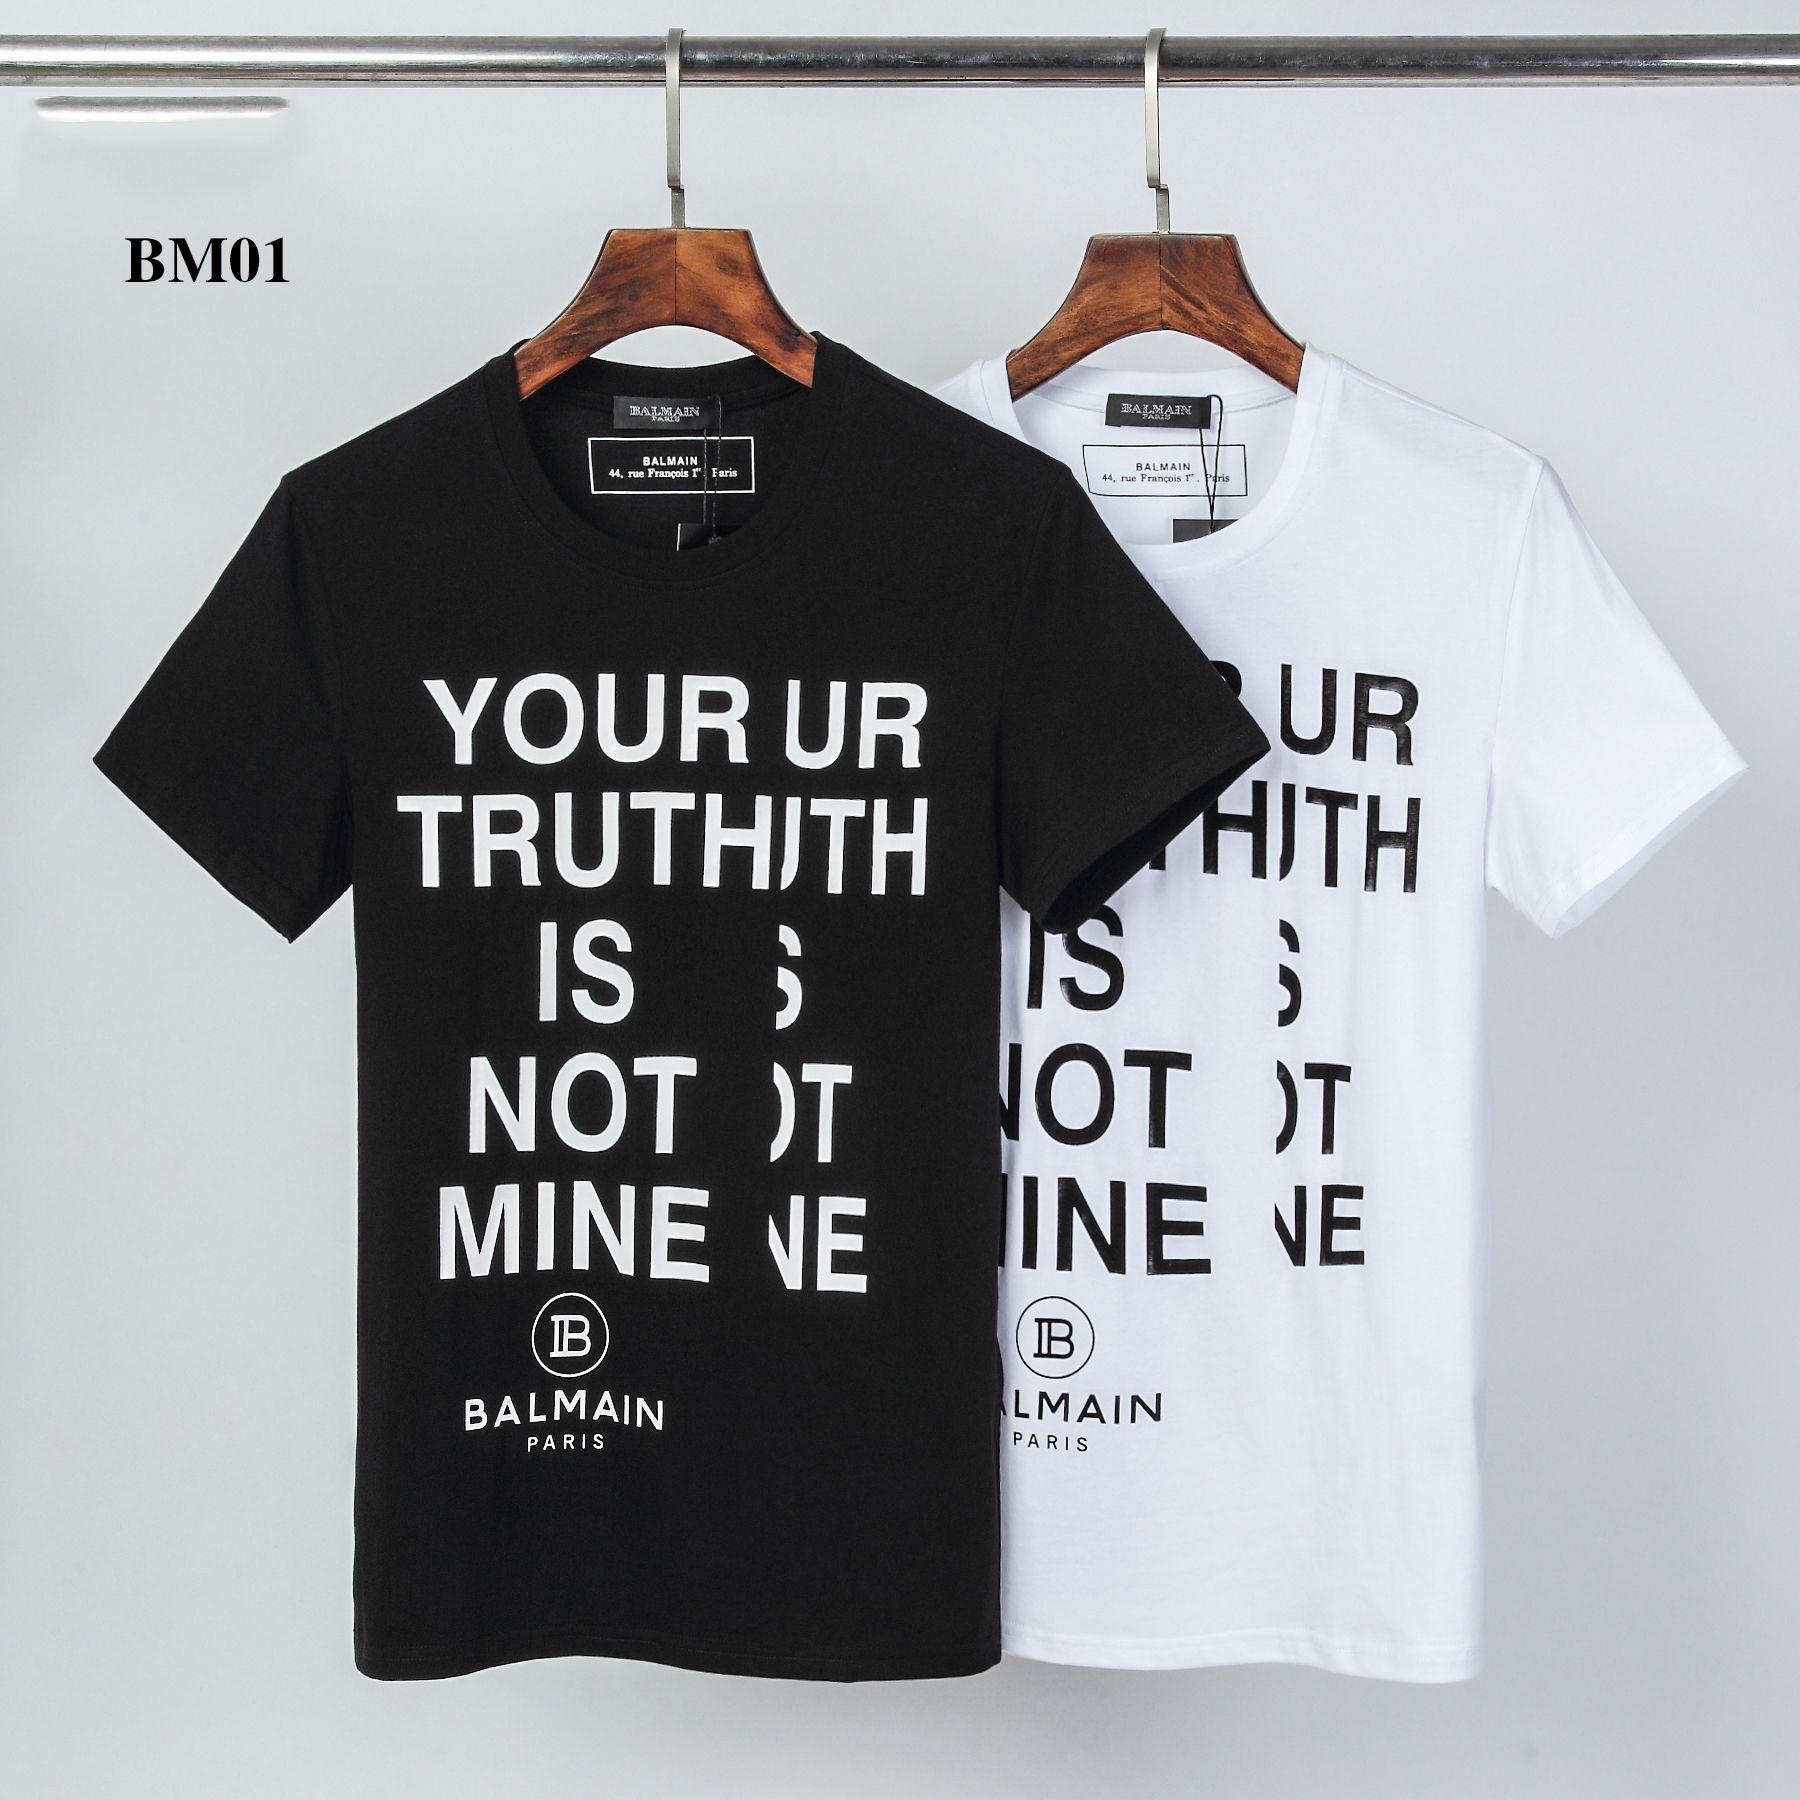 BM01 Designershirts Homens Mulheres Verão Novo Luxo T-shirt Mens Brandshirts manga curta letra impressa Mens Top Tees Streetwear 2020570K